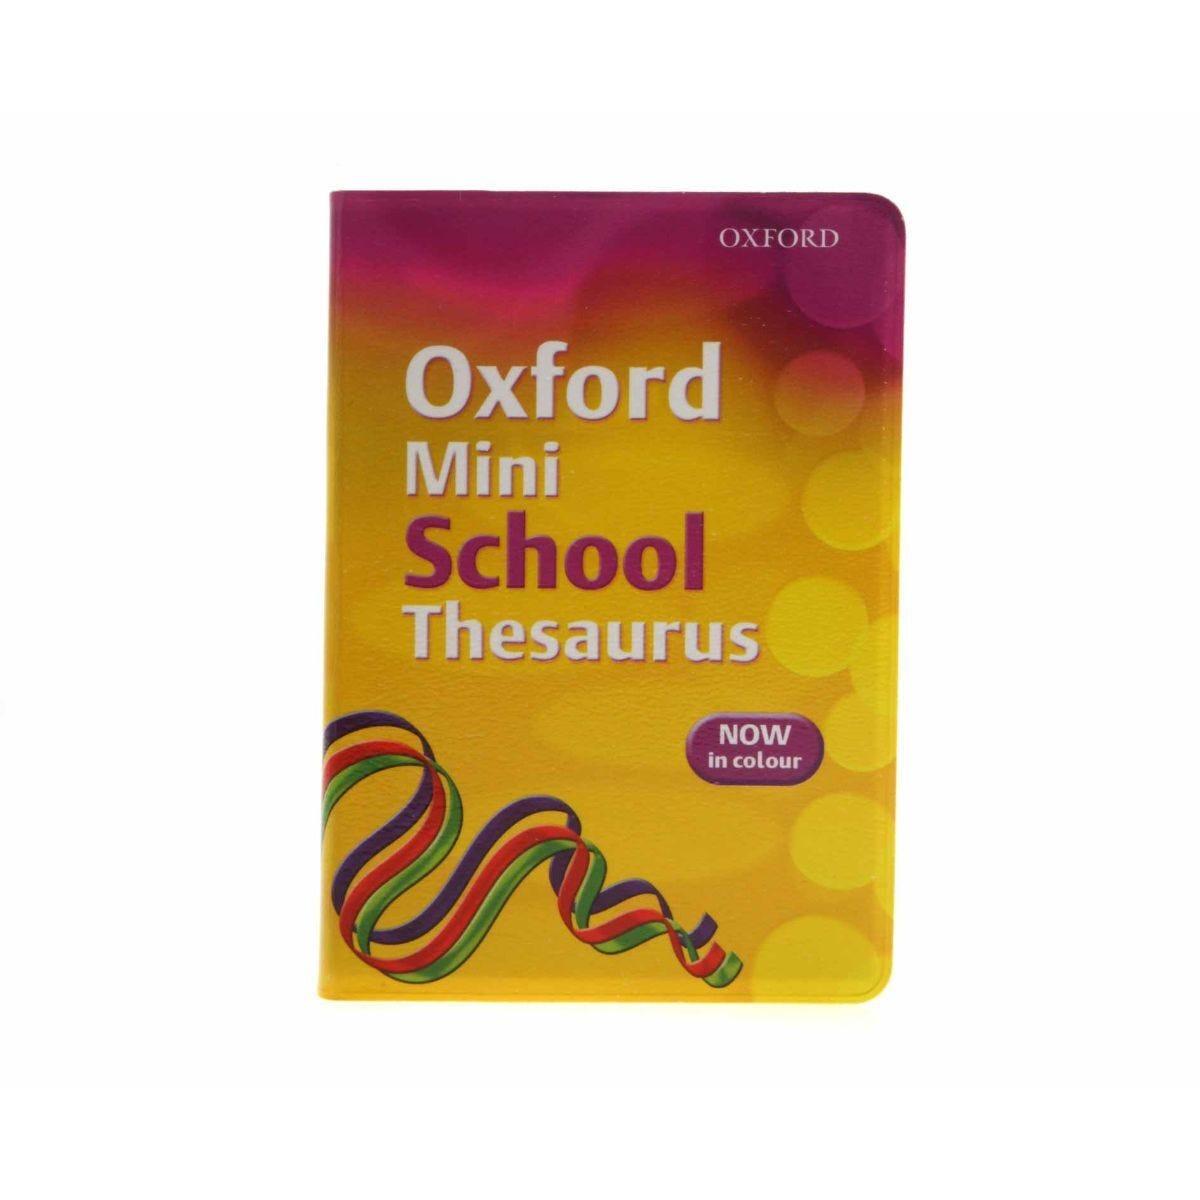 Oxford Thesaurus Mini School